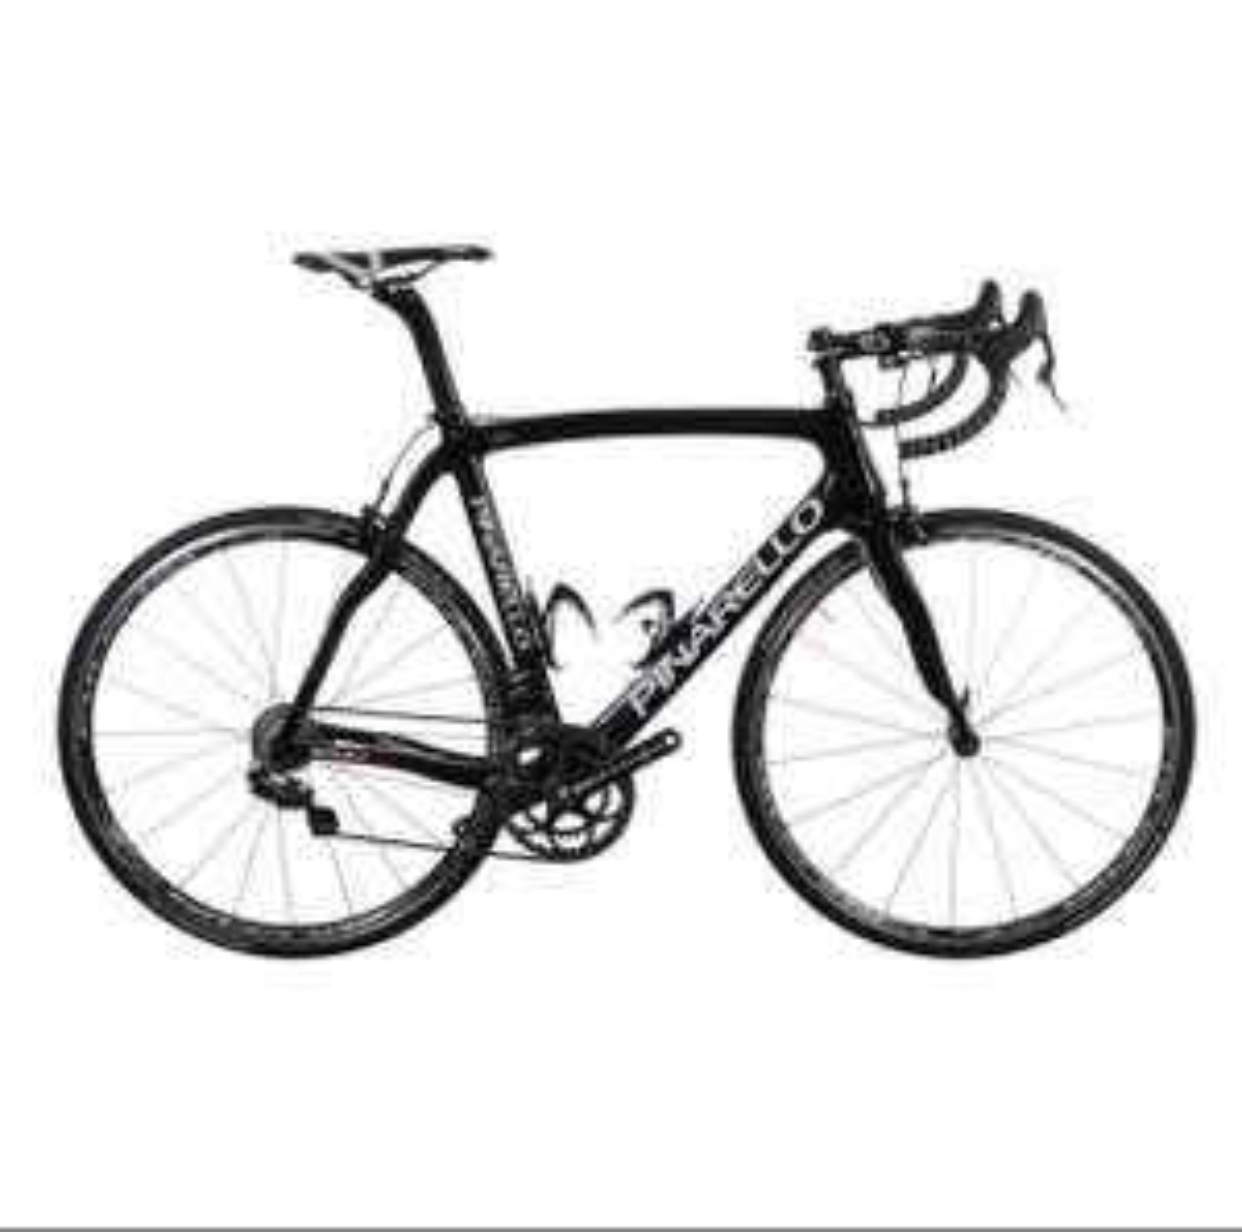 PINARELLO Carbon UD Road Bike Campagnolo Athena EPS £1500 at swinnertoncycles